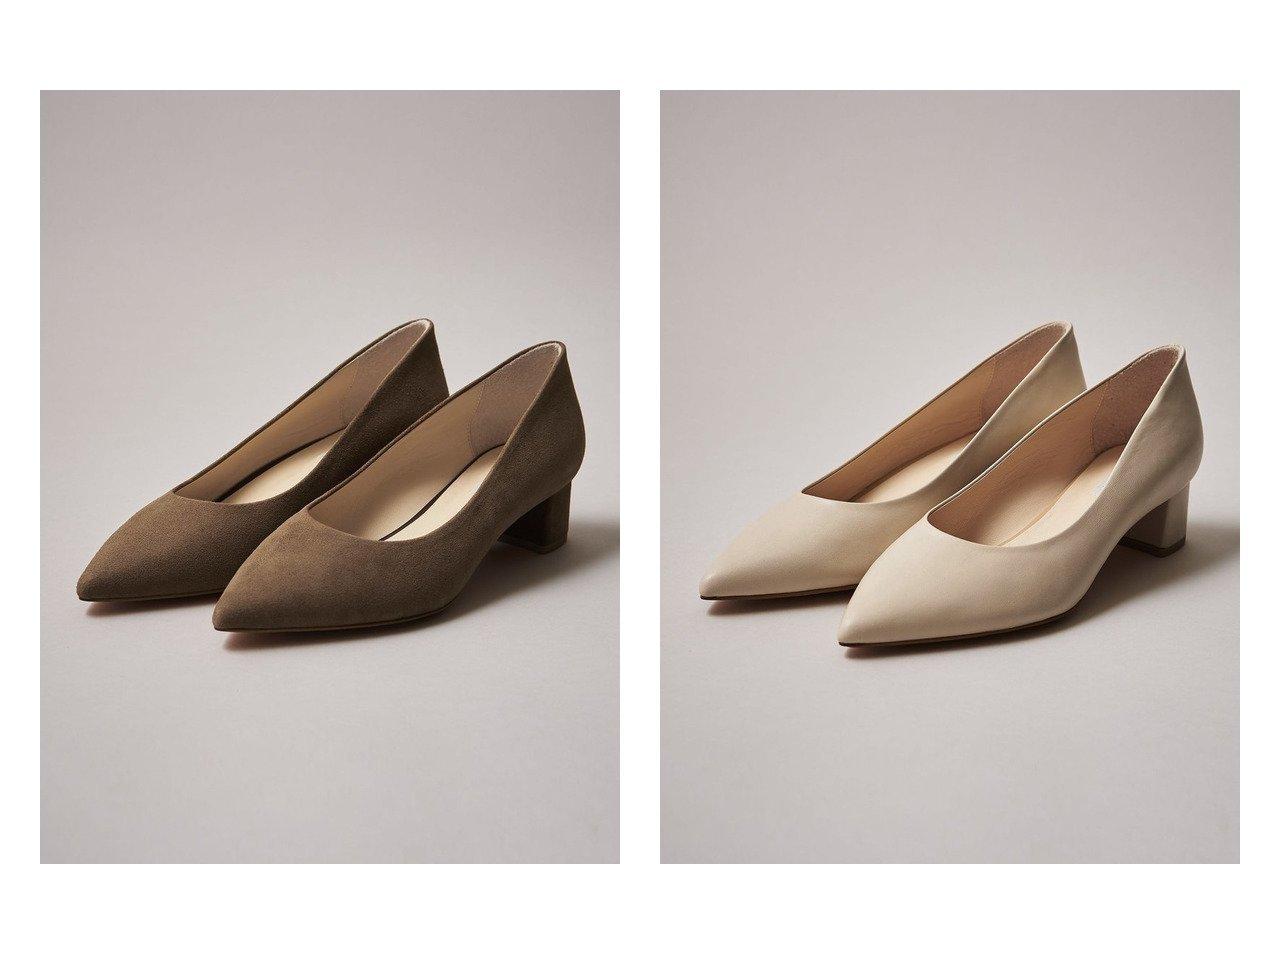 【Odette e Odile/オデット エ オディール】のポインテッド パンプス40↓↑ 【シューズ・靴】おすすめ!人気、トレンド・レディースファッションの通販   おすすめで人気の流行・トレンド、ファッションの通販商品 インテリア・家具・メンズファッション・キッズファッション・レディースファッション・服の通販 founy(ファニー) https://founy.com/ ファッション Fashion レディースファッション WOMEN NEW・新作・新着・新入荷 New Arrivals シューズ ポインテッド |ID:crp329100000058840